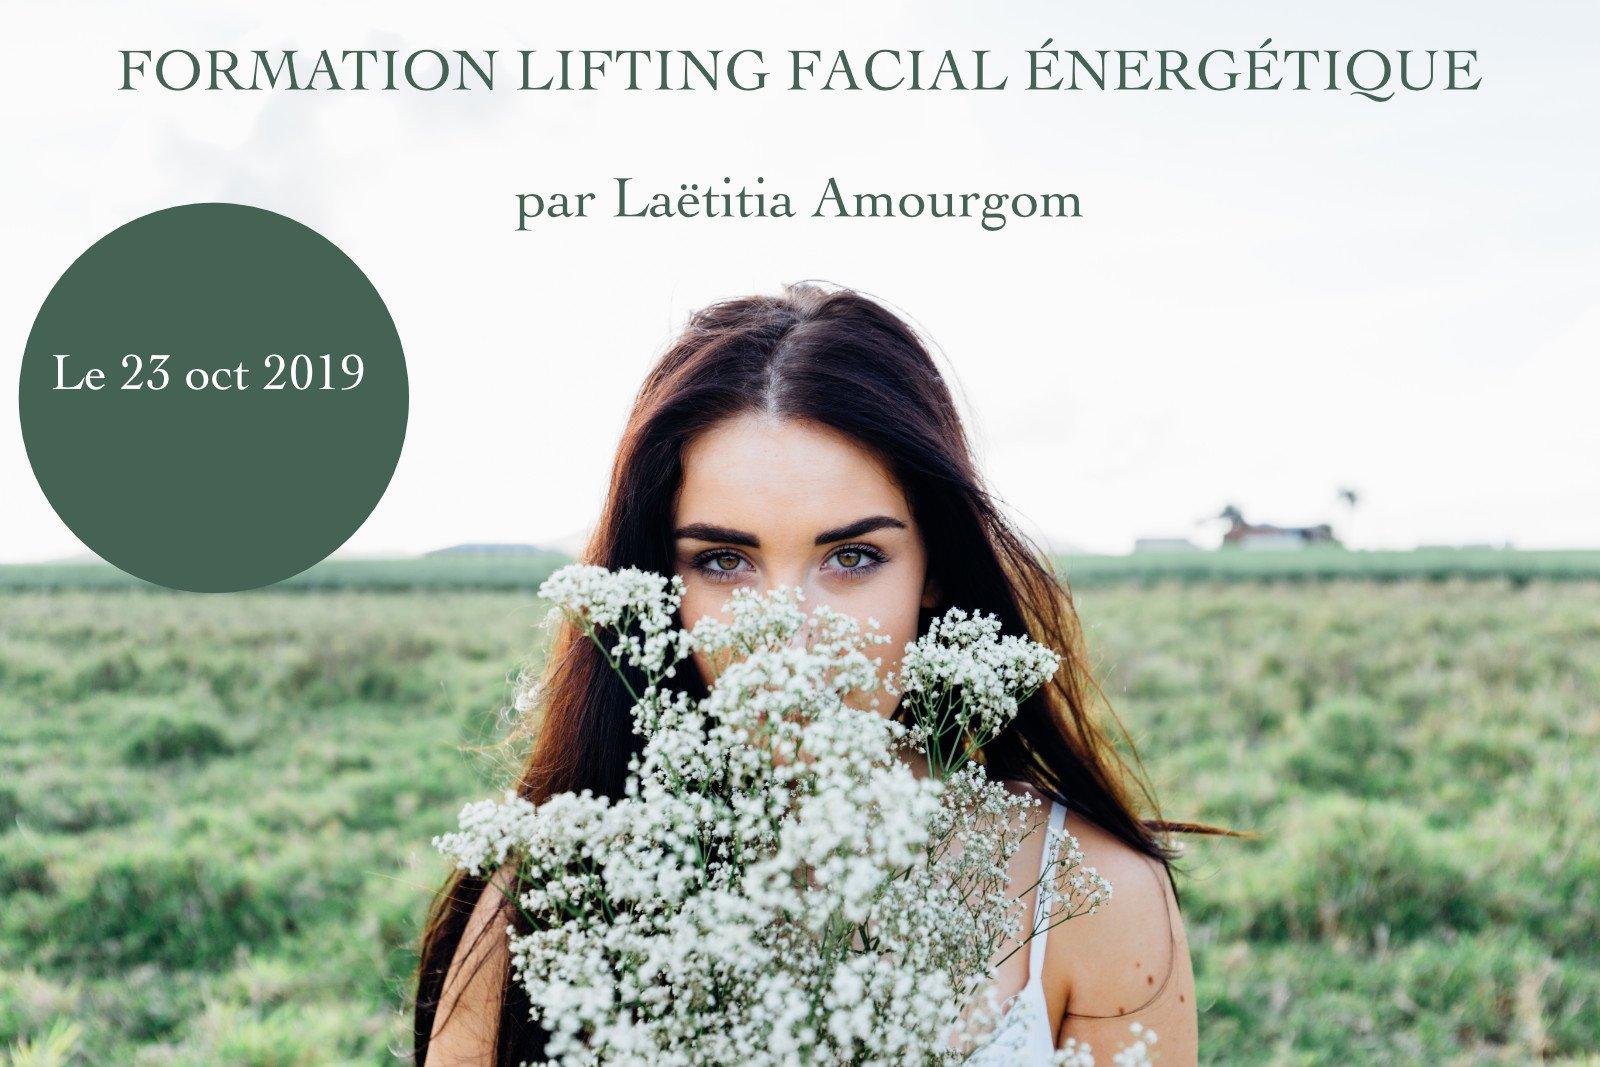 formation_lifting_facial_energetique - 23 oct 2019 - access_bars - a_la_reunion - laetitia amourgom - Être Soi